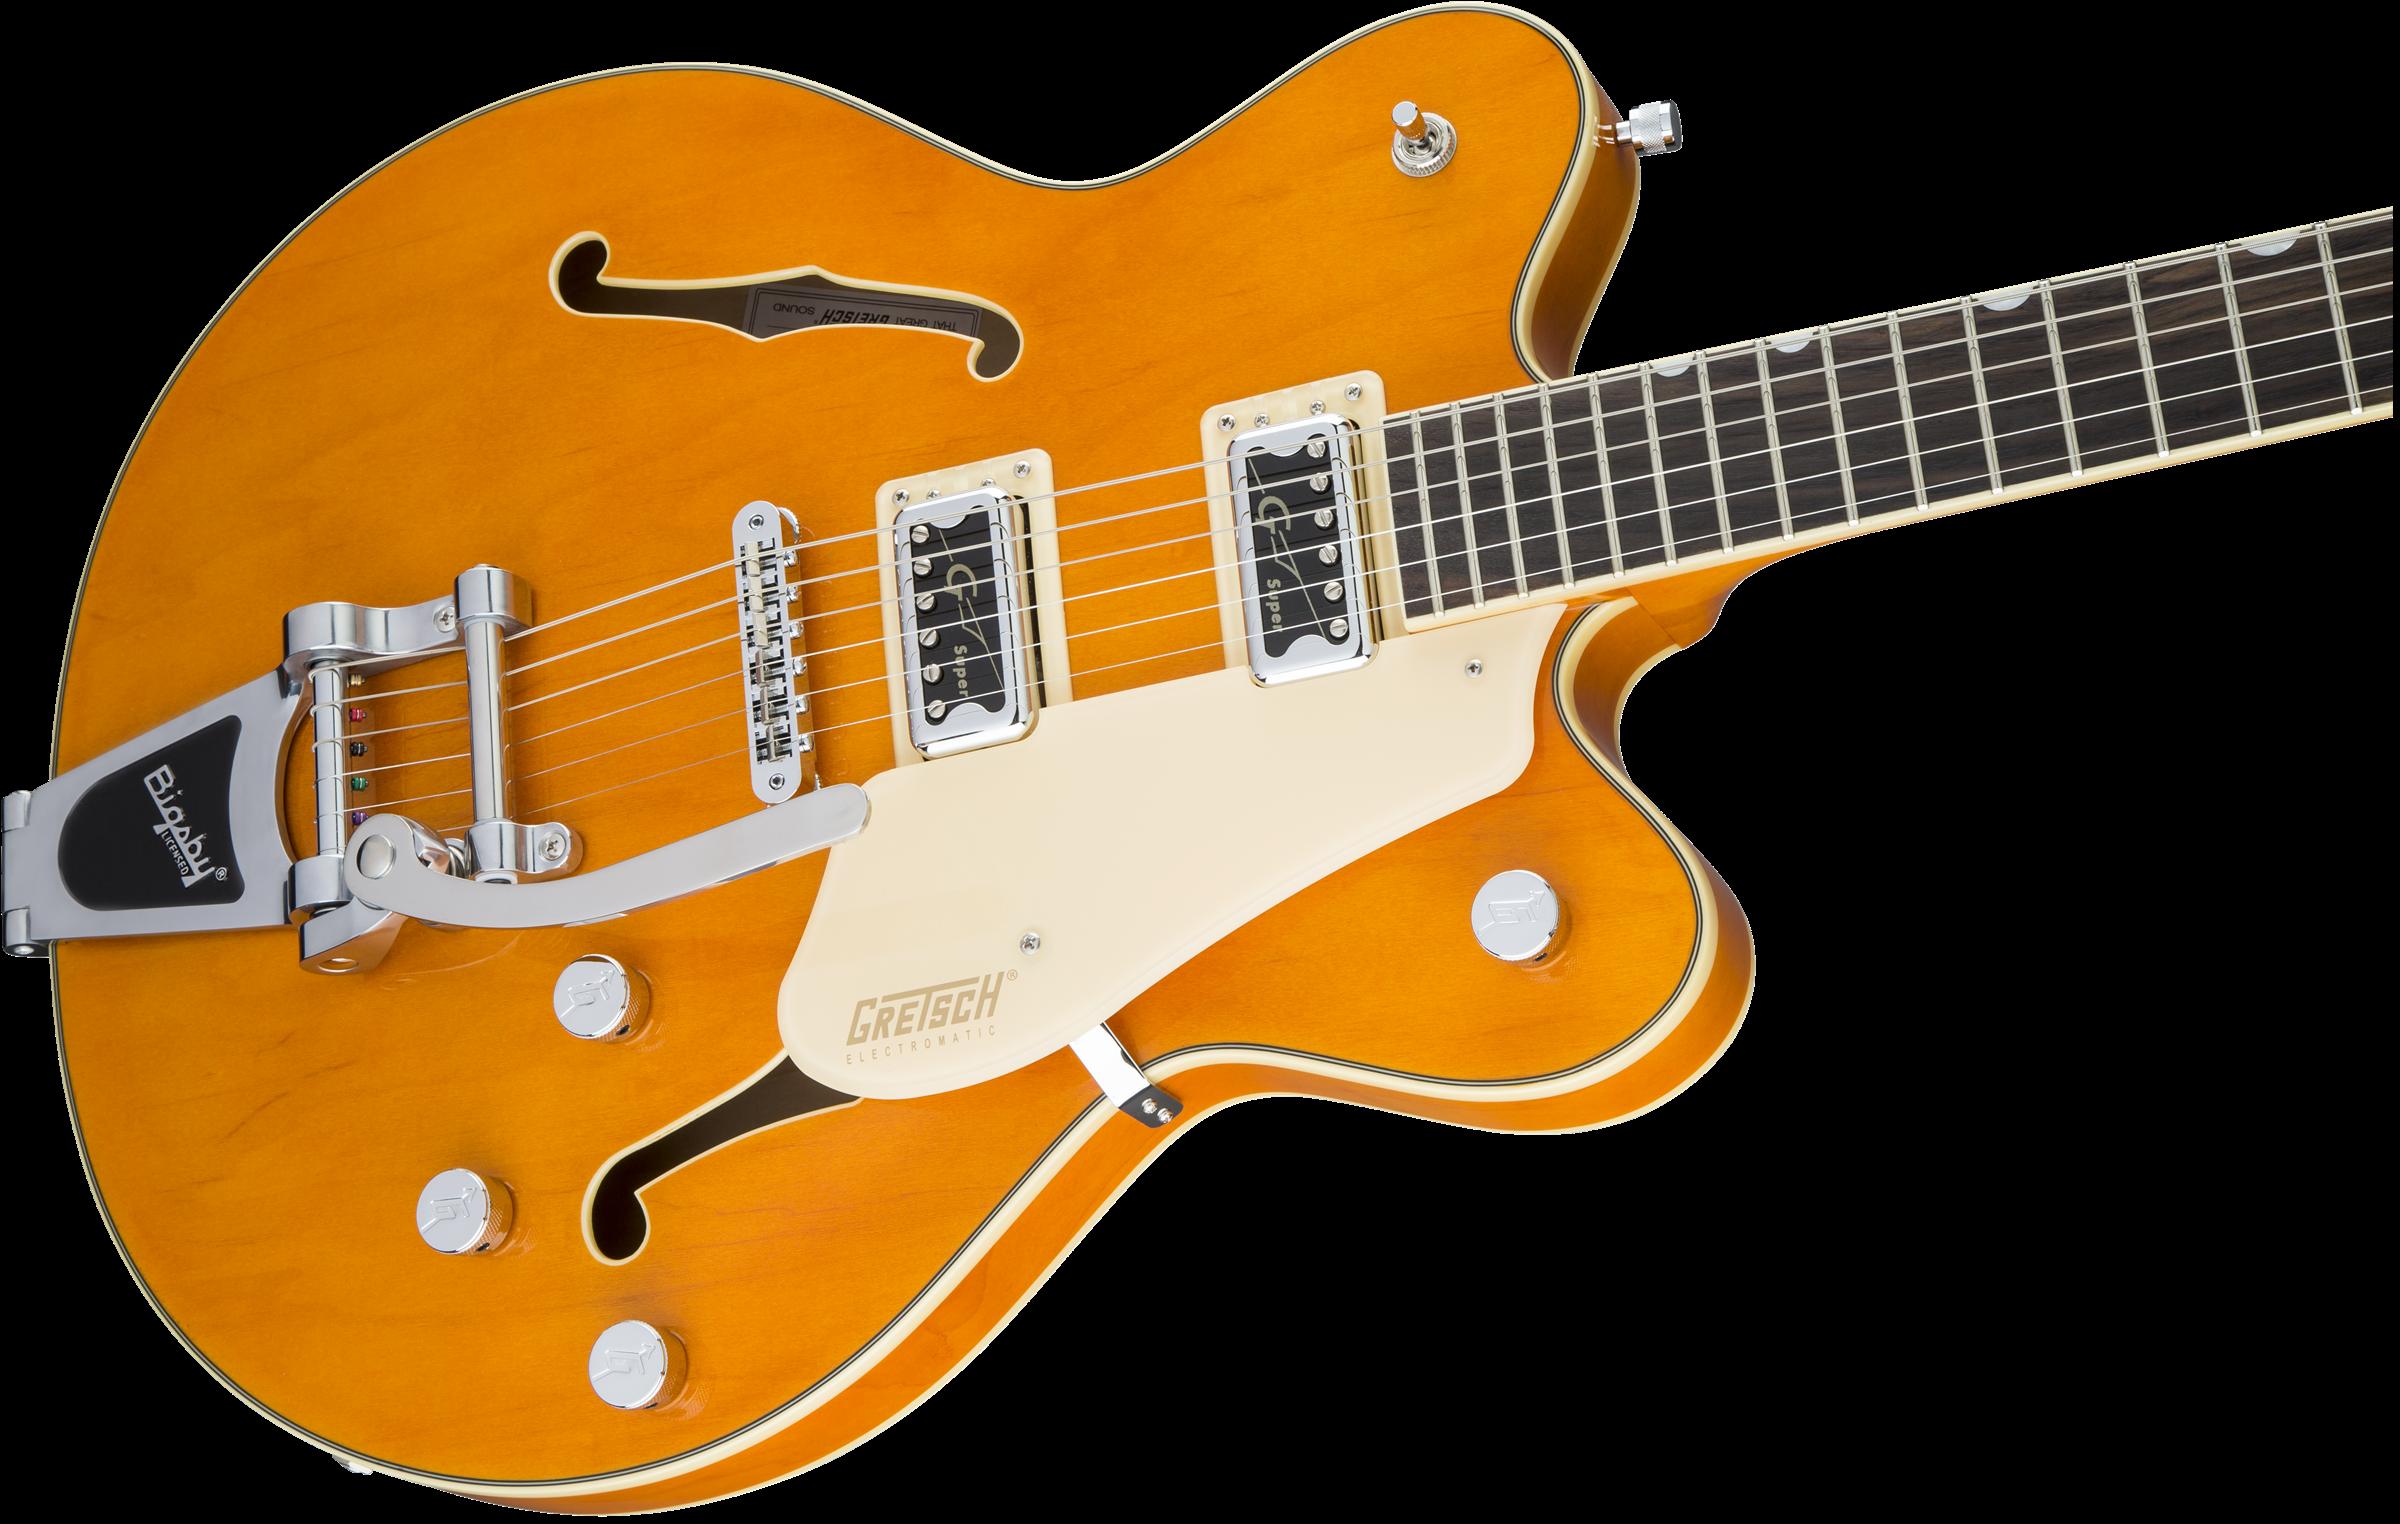 Gretsch G5622T Electromatic Center Block Double-Cut - Orange